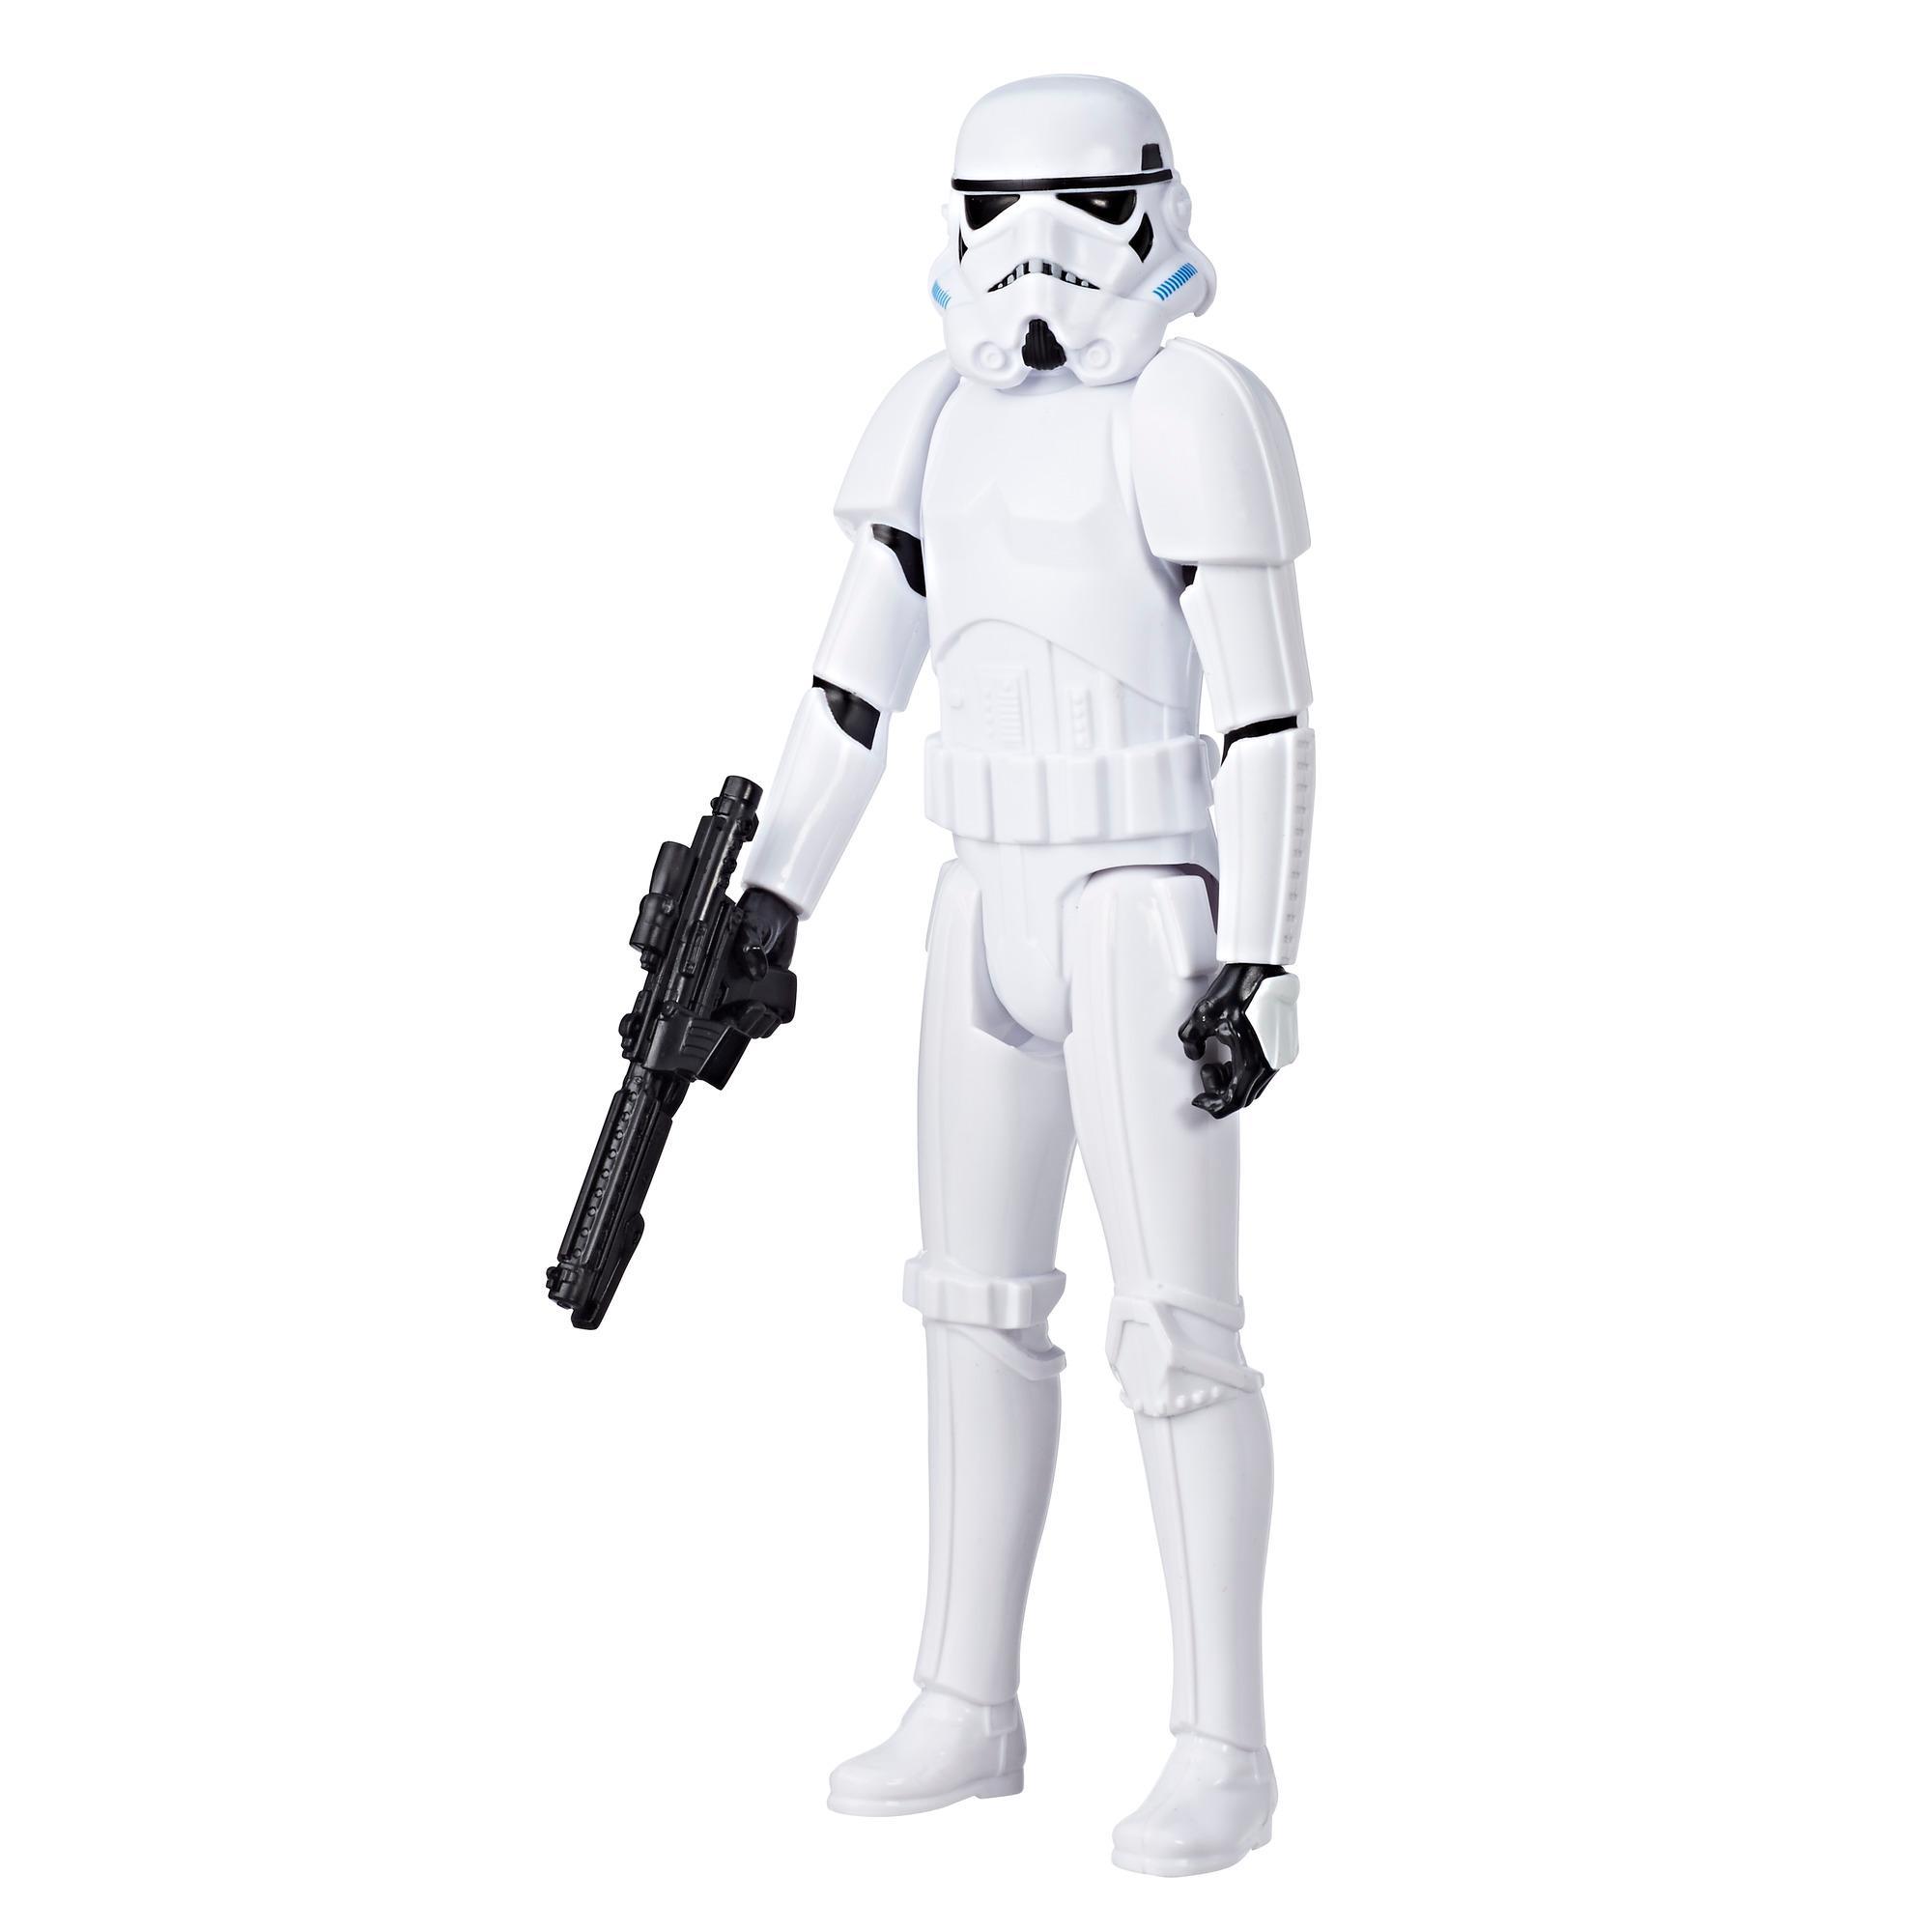 Star Wars: Rogue One - Figurine de Stormtrooper impérial  de 30 cm